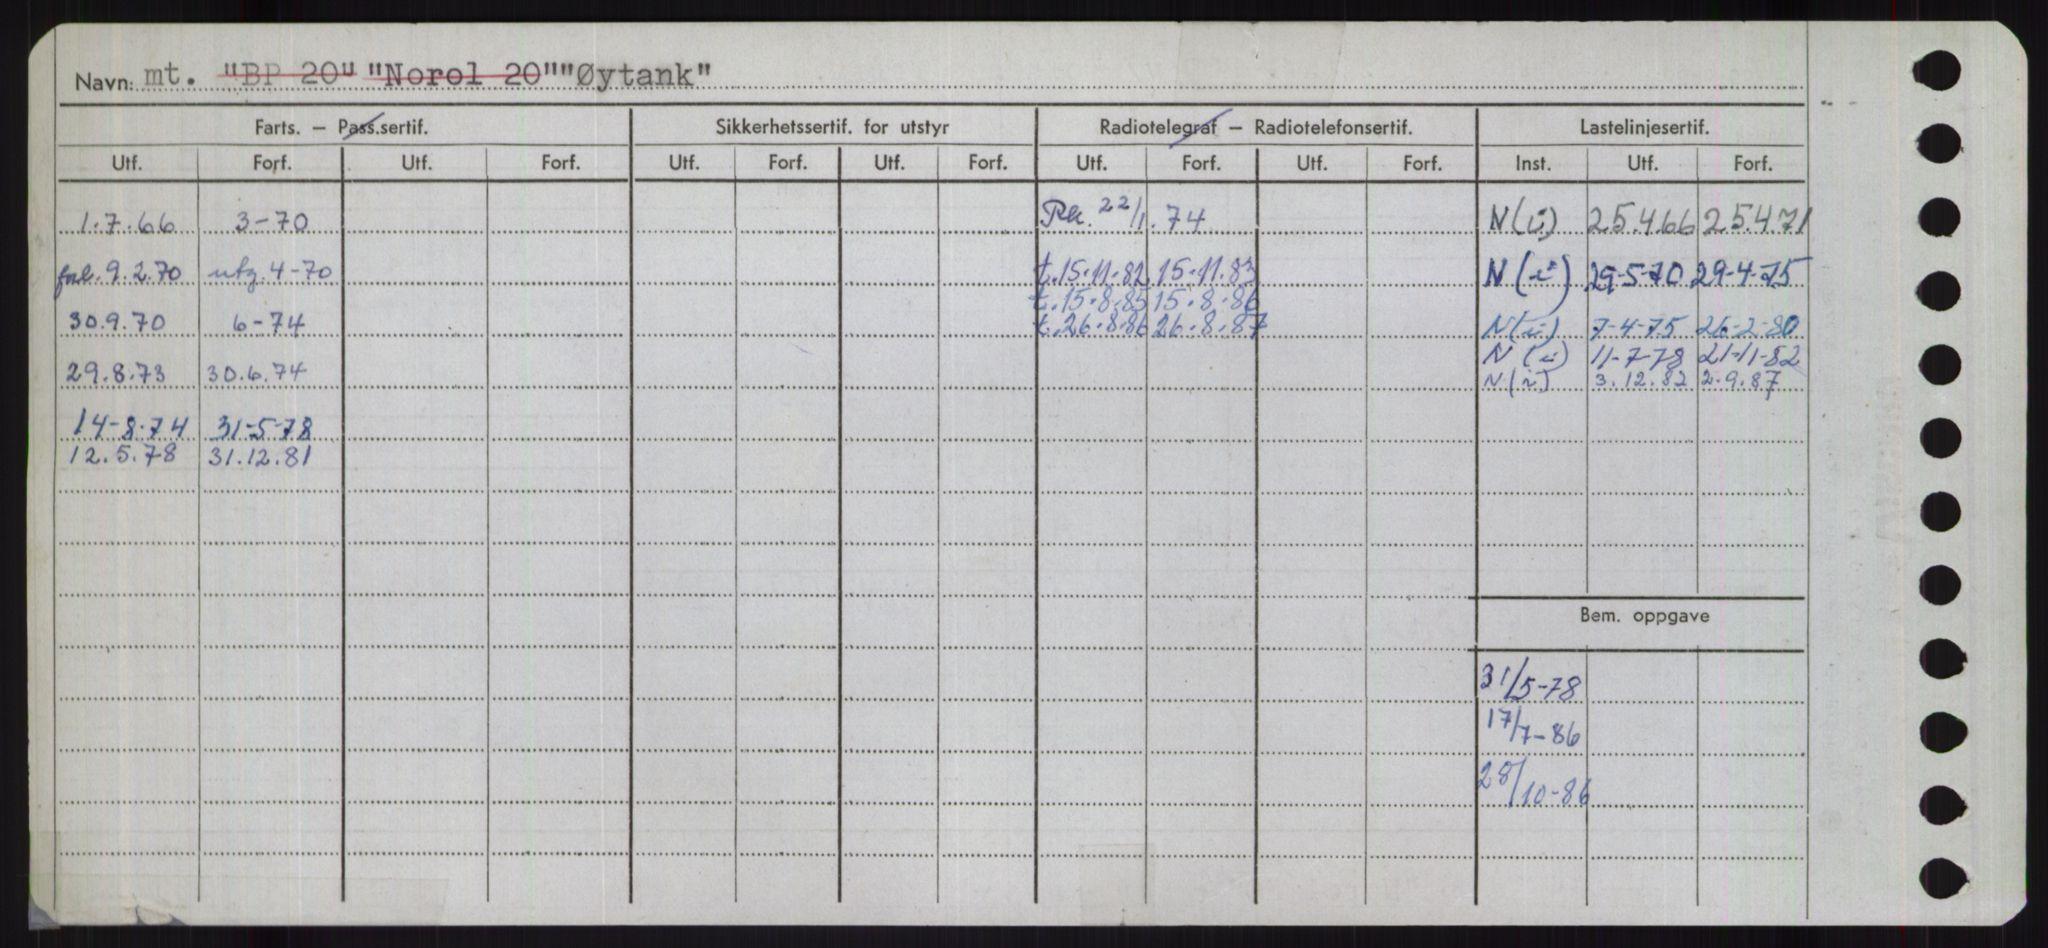 RA, Sjøfartsdirektoratet med forløpere, Skipsmålingen, H/Ha/L0006: Fartøy, Sver-Å, s. 855